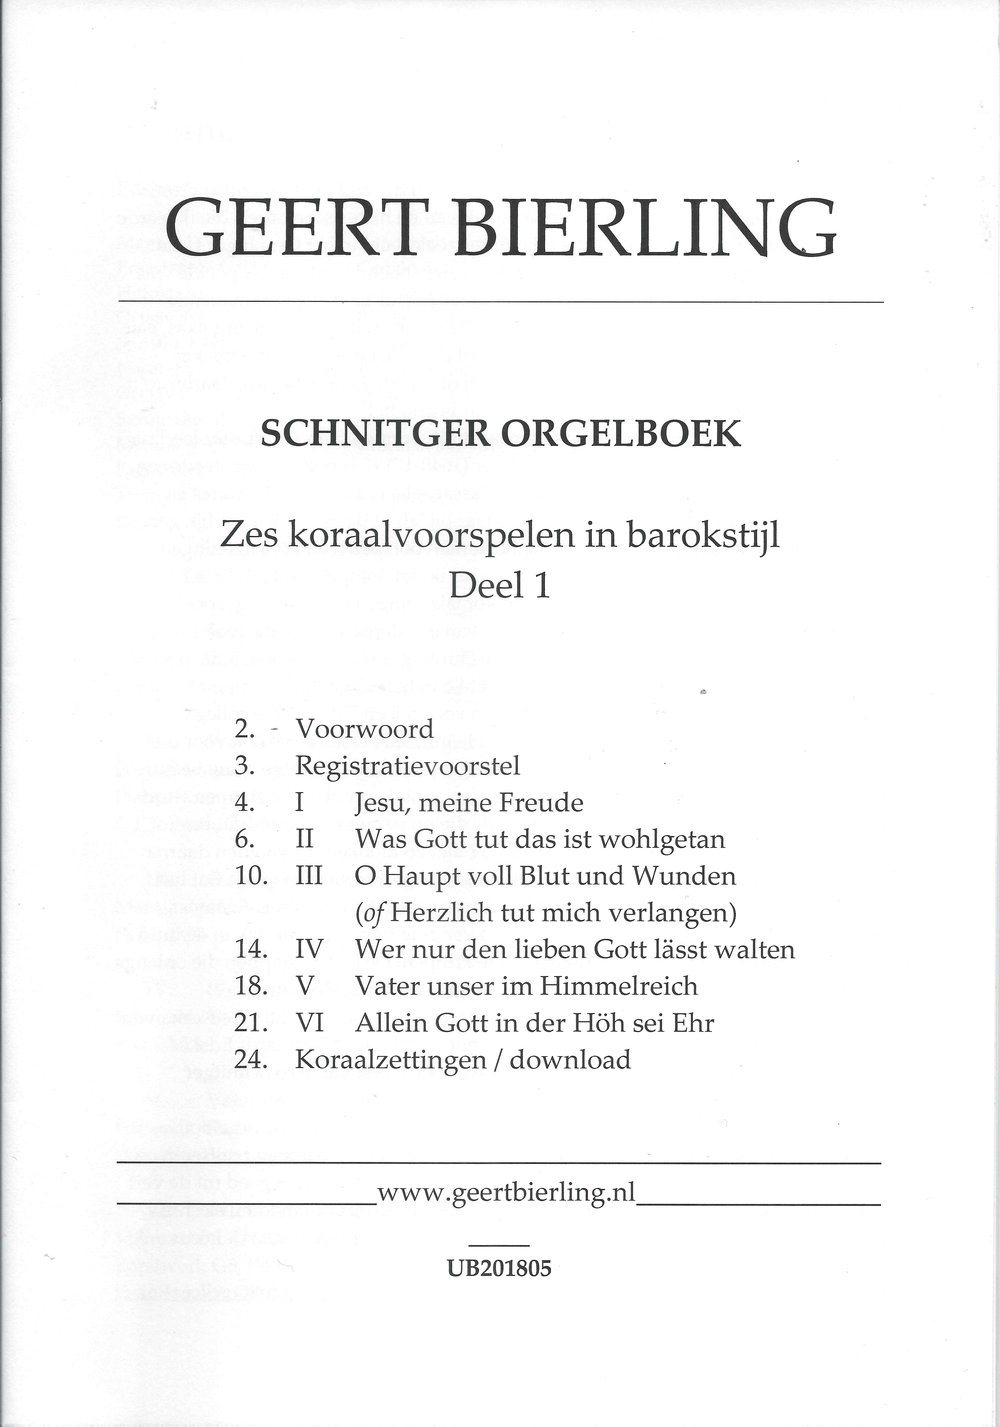 SCHNITGER ORGELBOEK I - inhoudsopgave.jpg